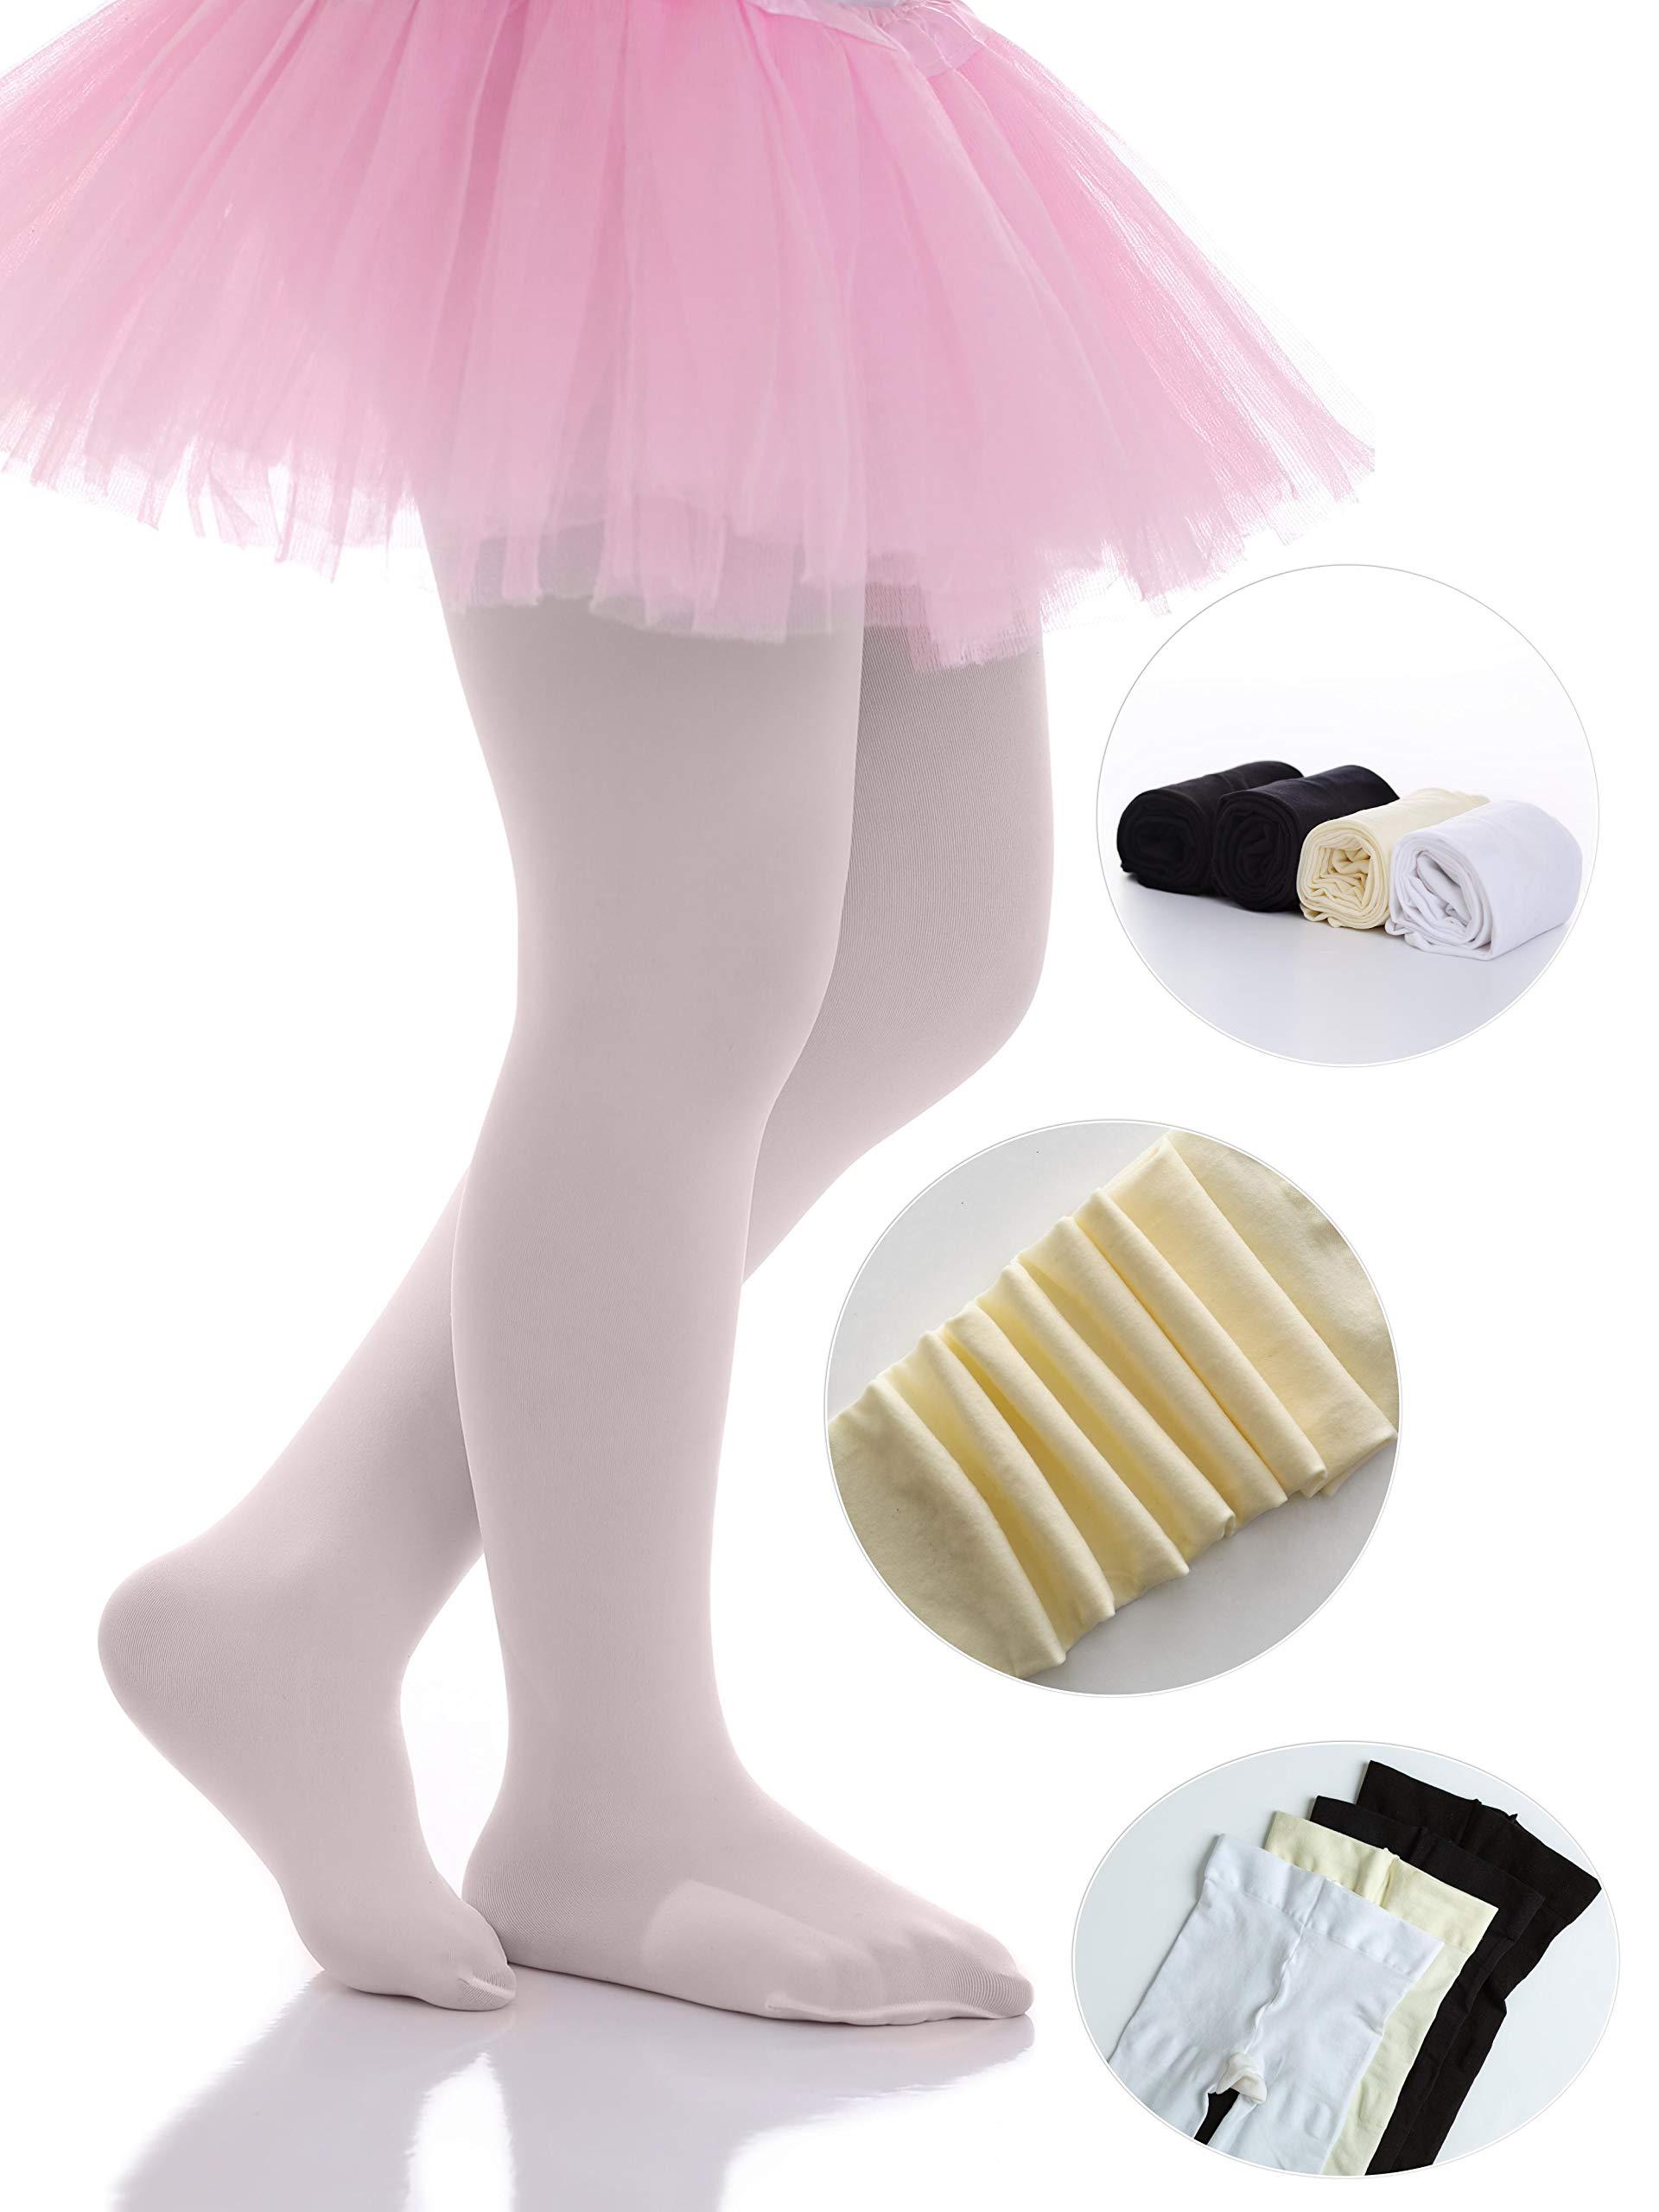 Girls White and Pink 70 denier Ballet dancewear stage costume dress tights